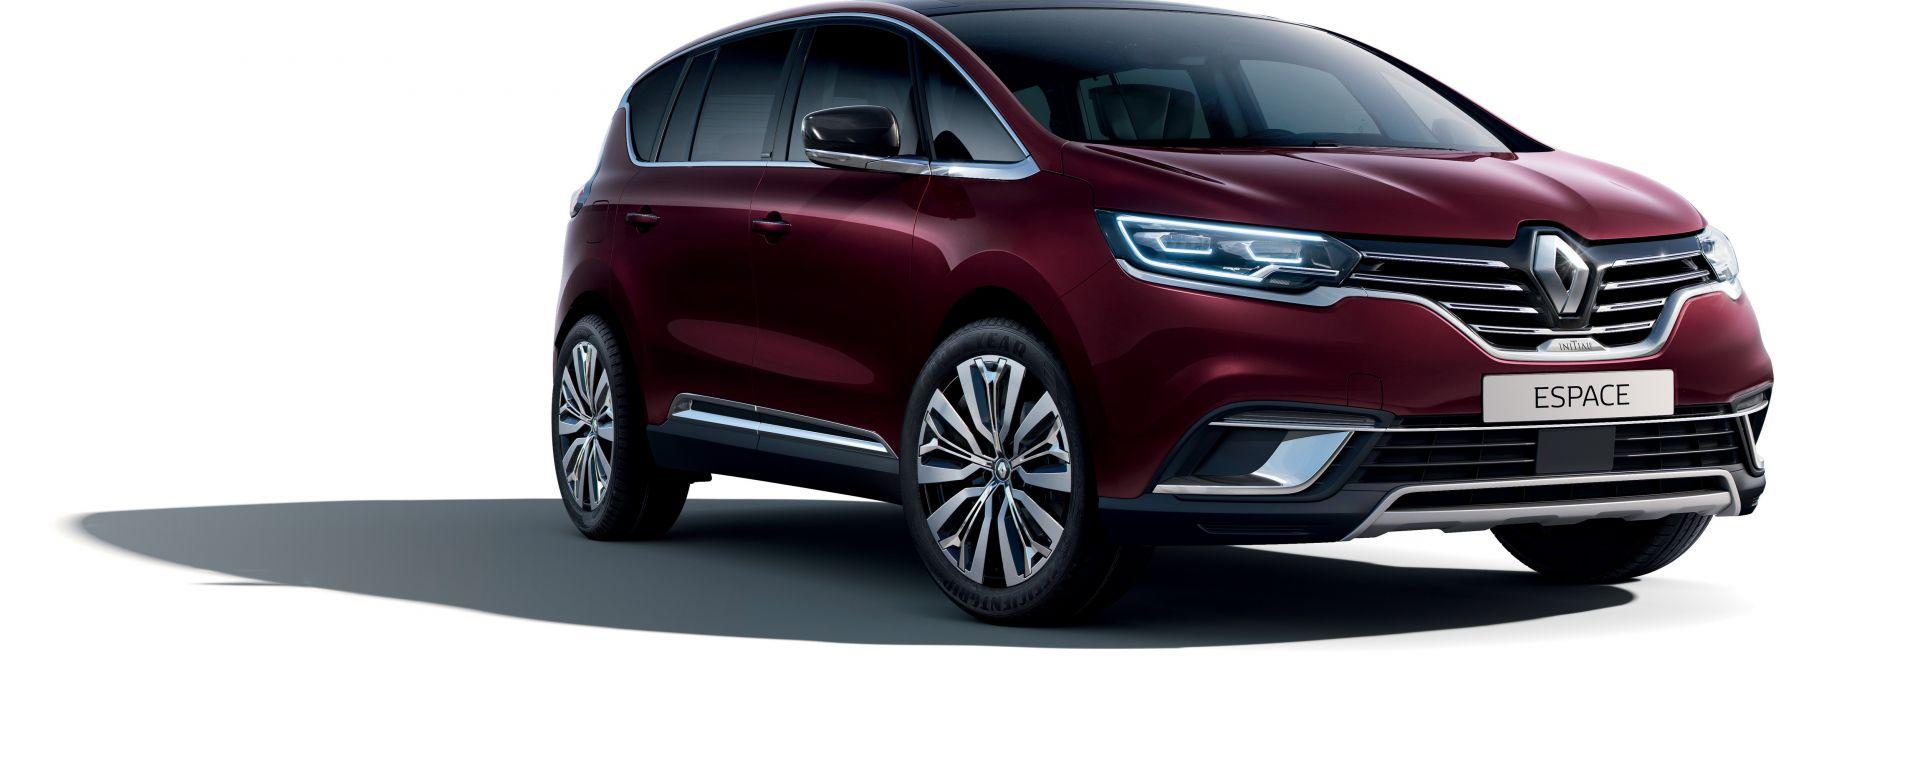 Nuova Renault Espace Initiale Paris: il crossover 7 posti si rifà il look